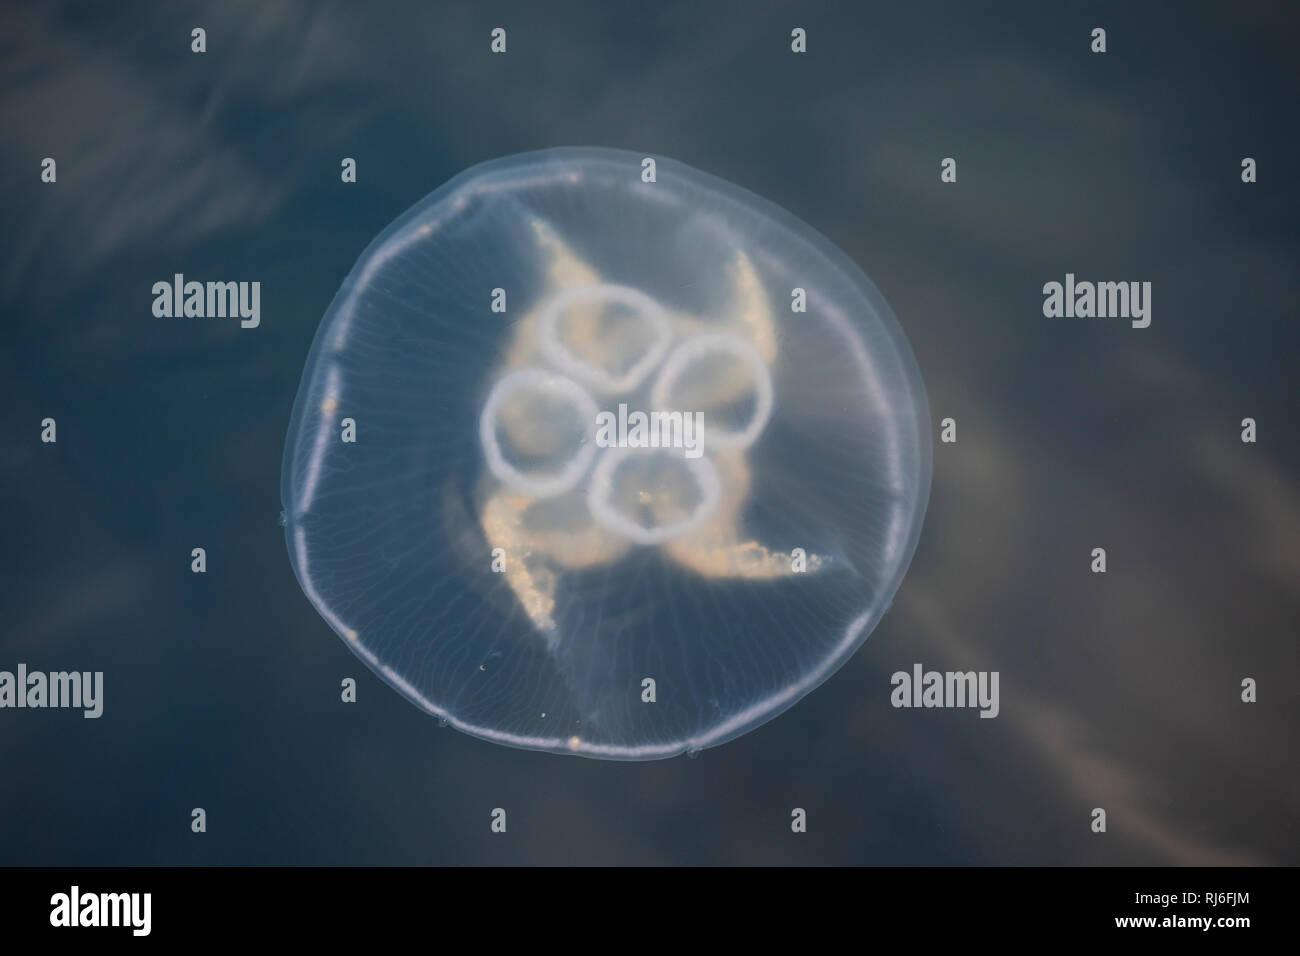 Ohrenqualle, Ohren-Qualle, Qualle, Quallen, Meduse, Aurelia aurita, moon jelly, moon jellyfish, common jellyfish, saucer jelly, La méduse commune, Aur - Stock Image